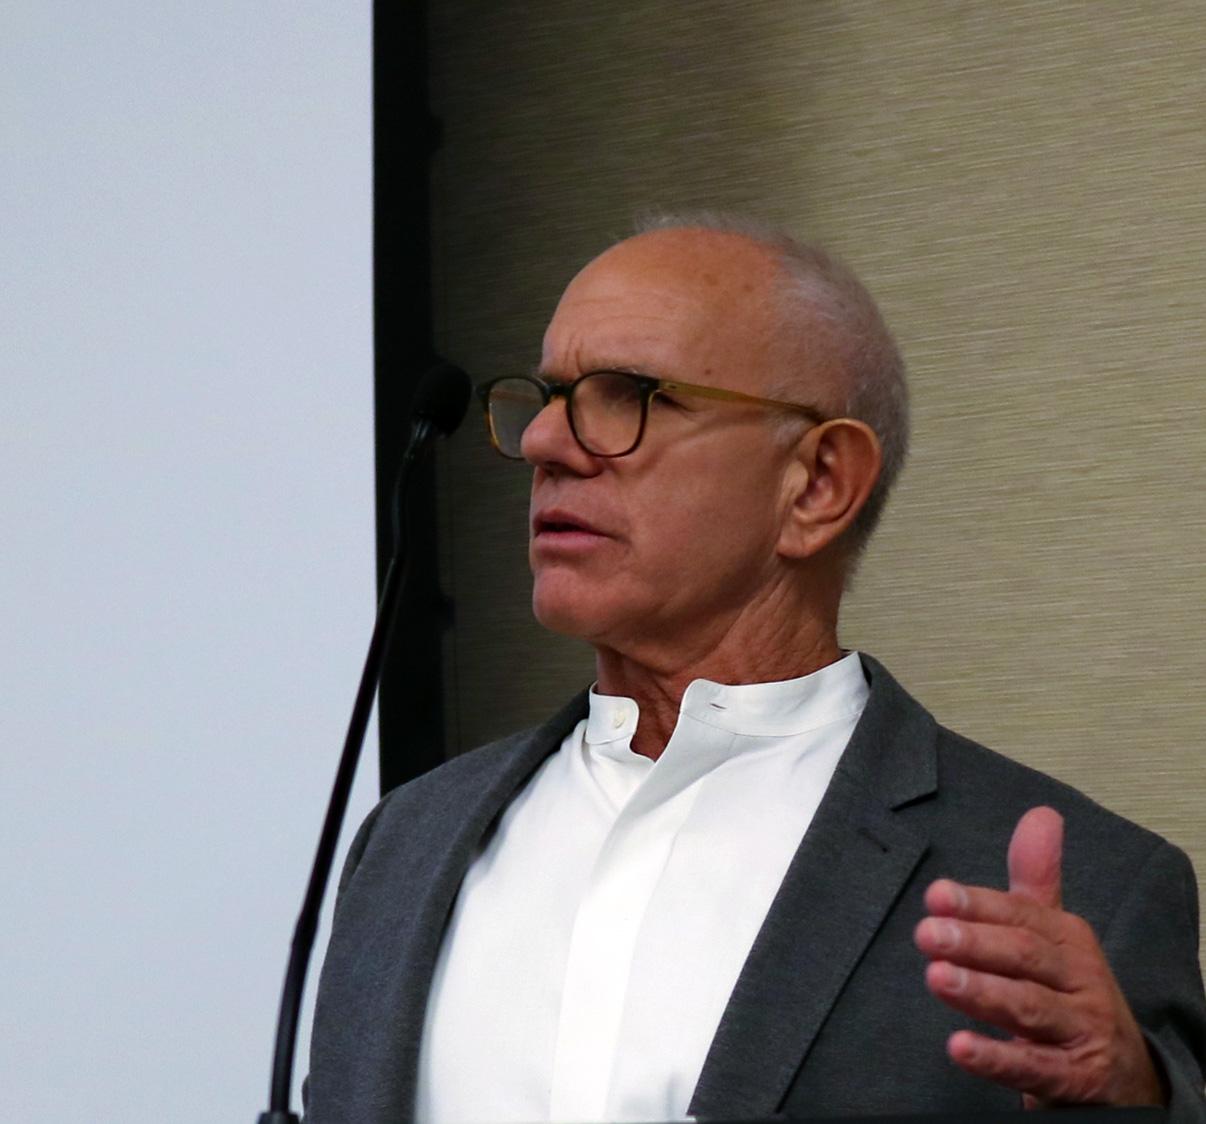 Wayne Sandler, PCFA Treasurer